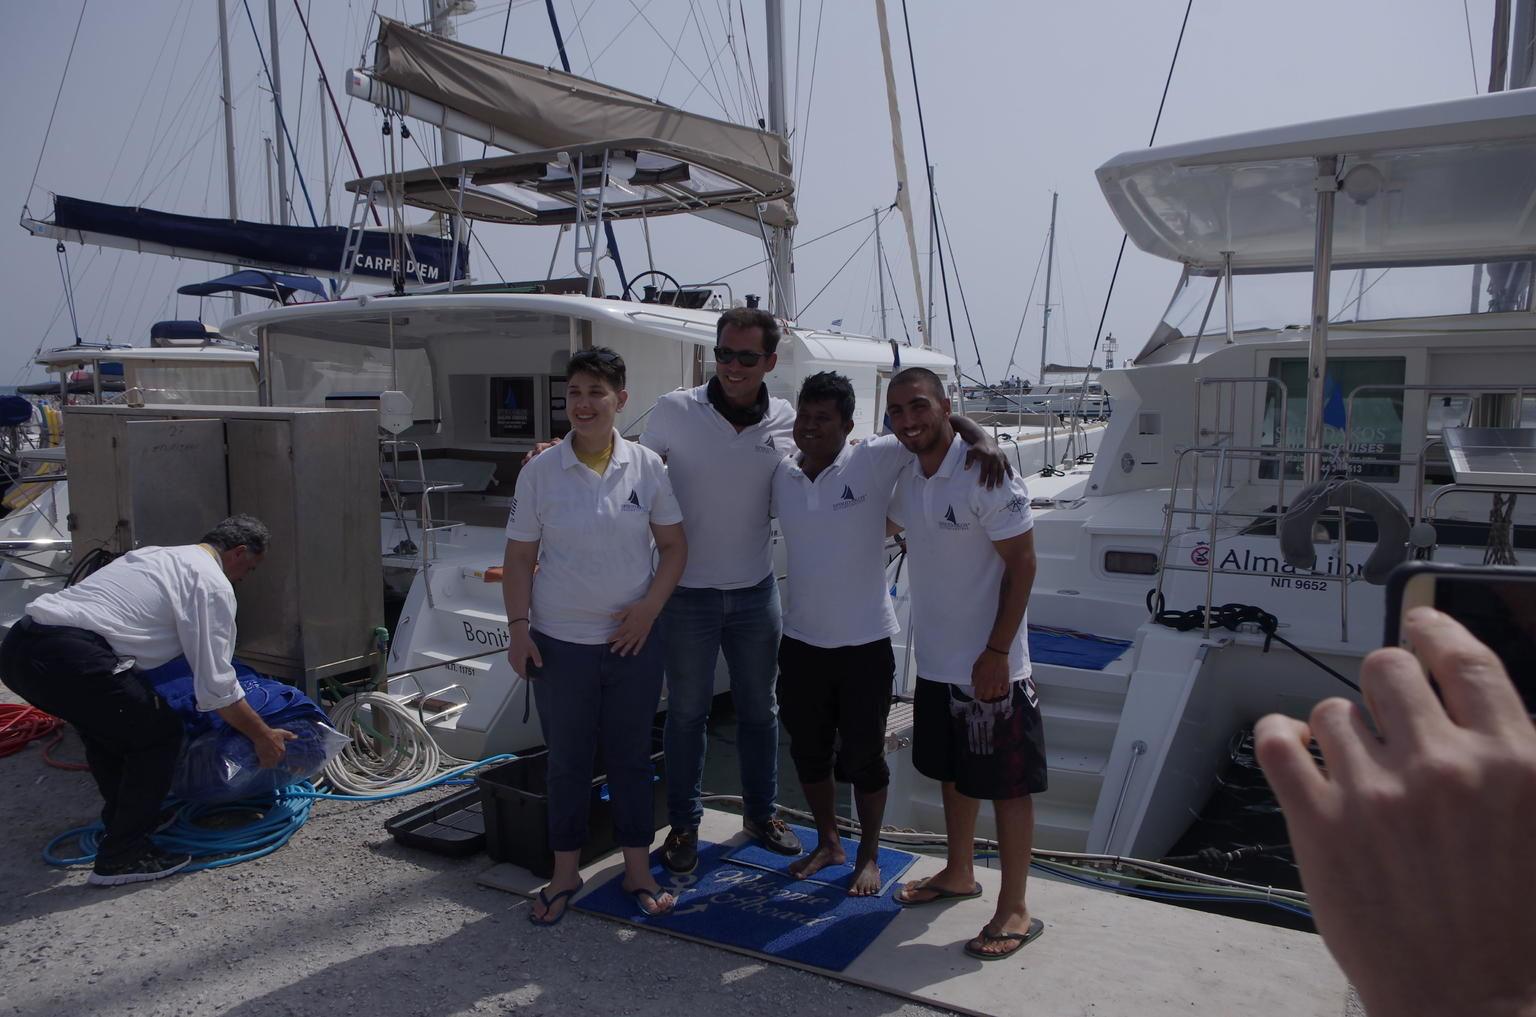 Semi Private Standard   Santorini Catamaran Cruise with Greek buffet and Drinks